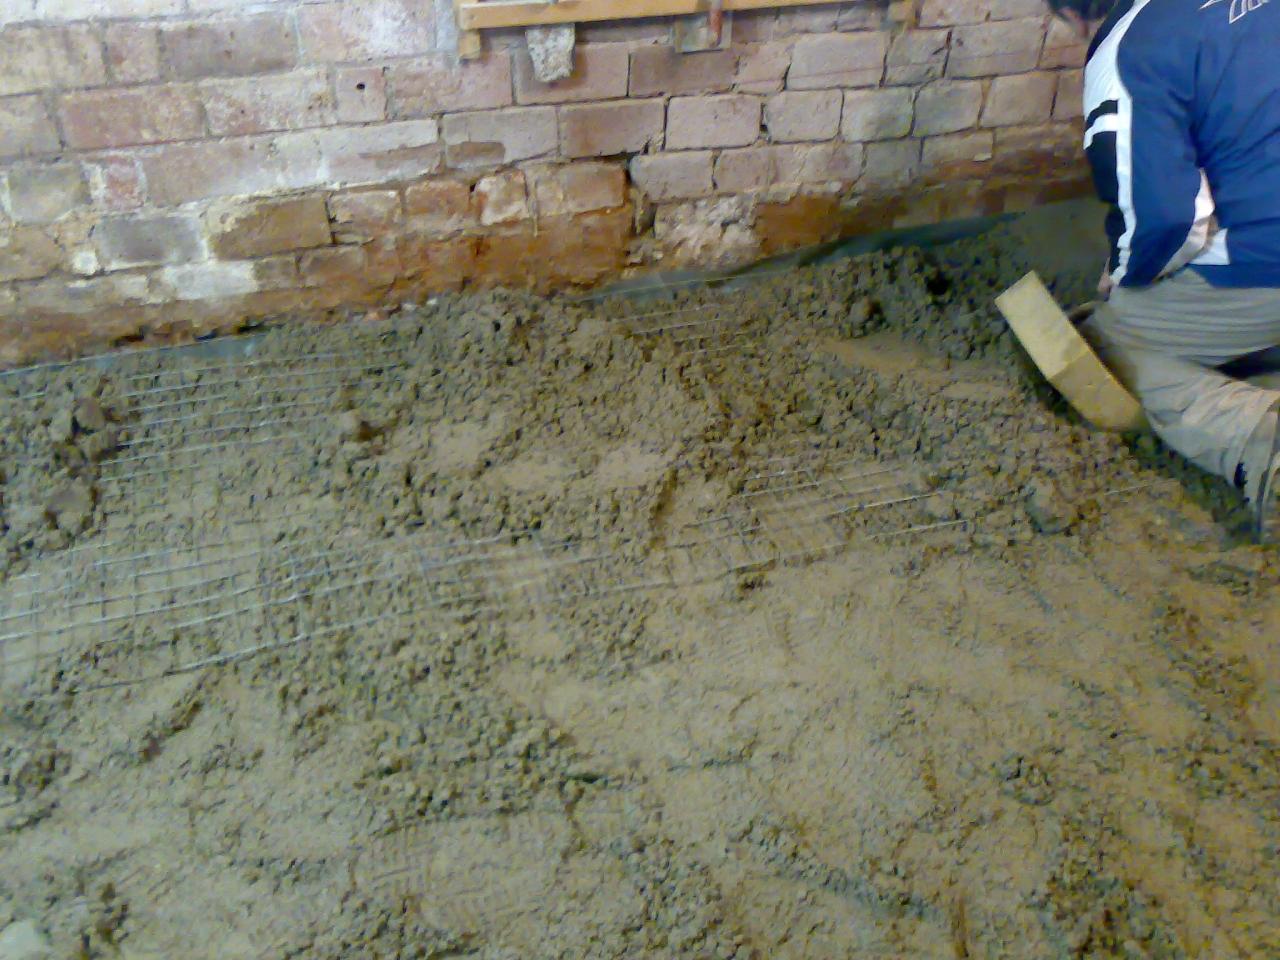 Fußboden Werkstatt ~ Werkstatt boden neu betonieren bauanleitung zum selberbauen